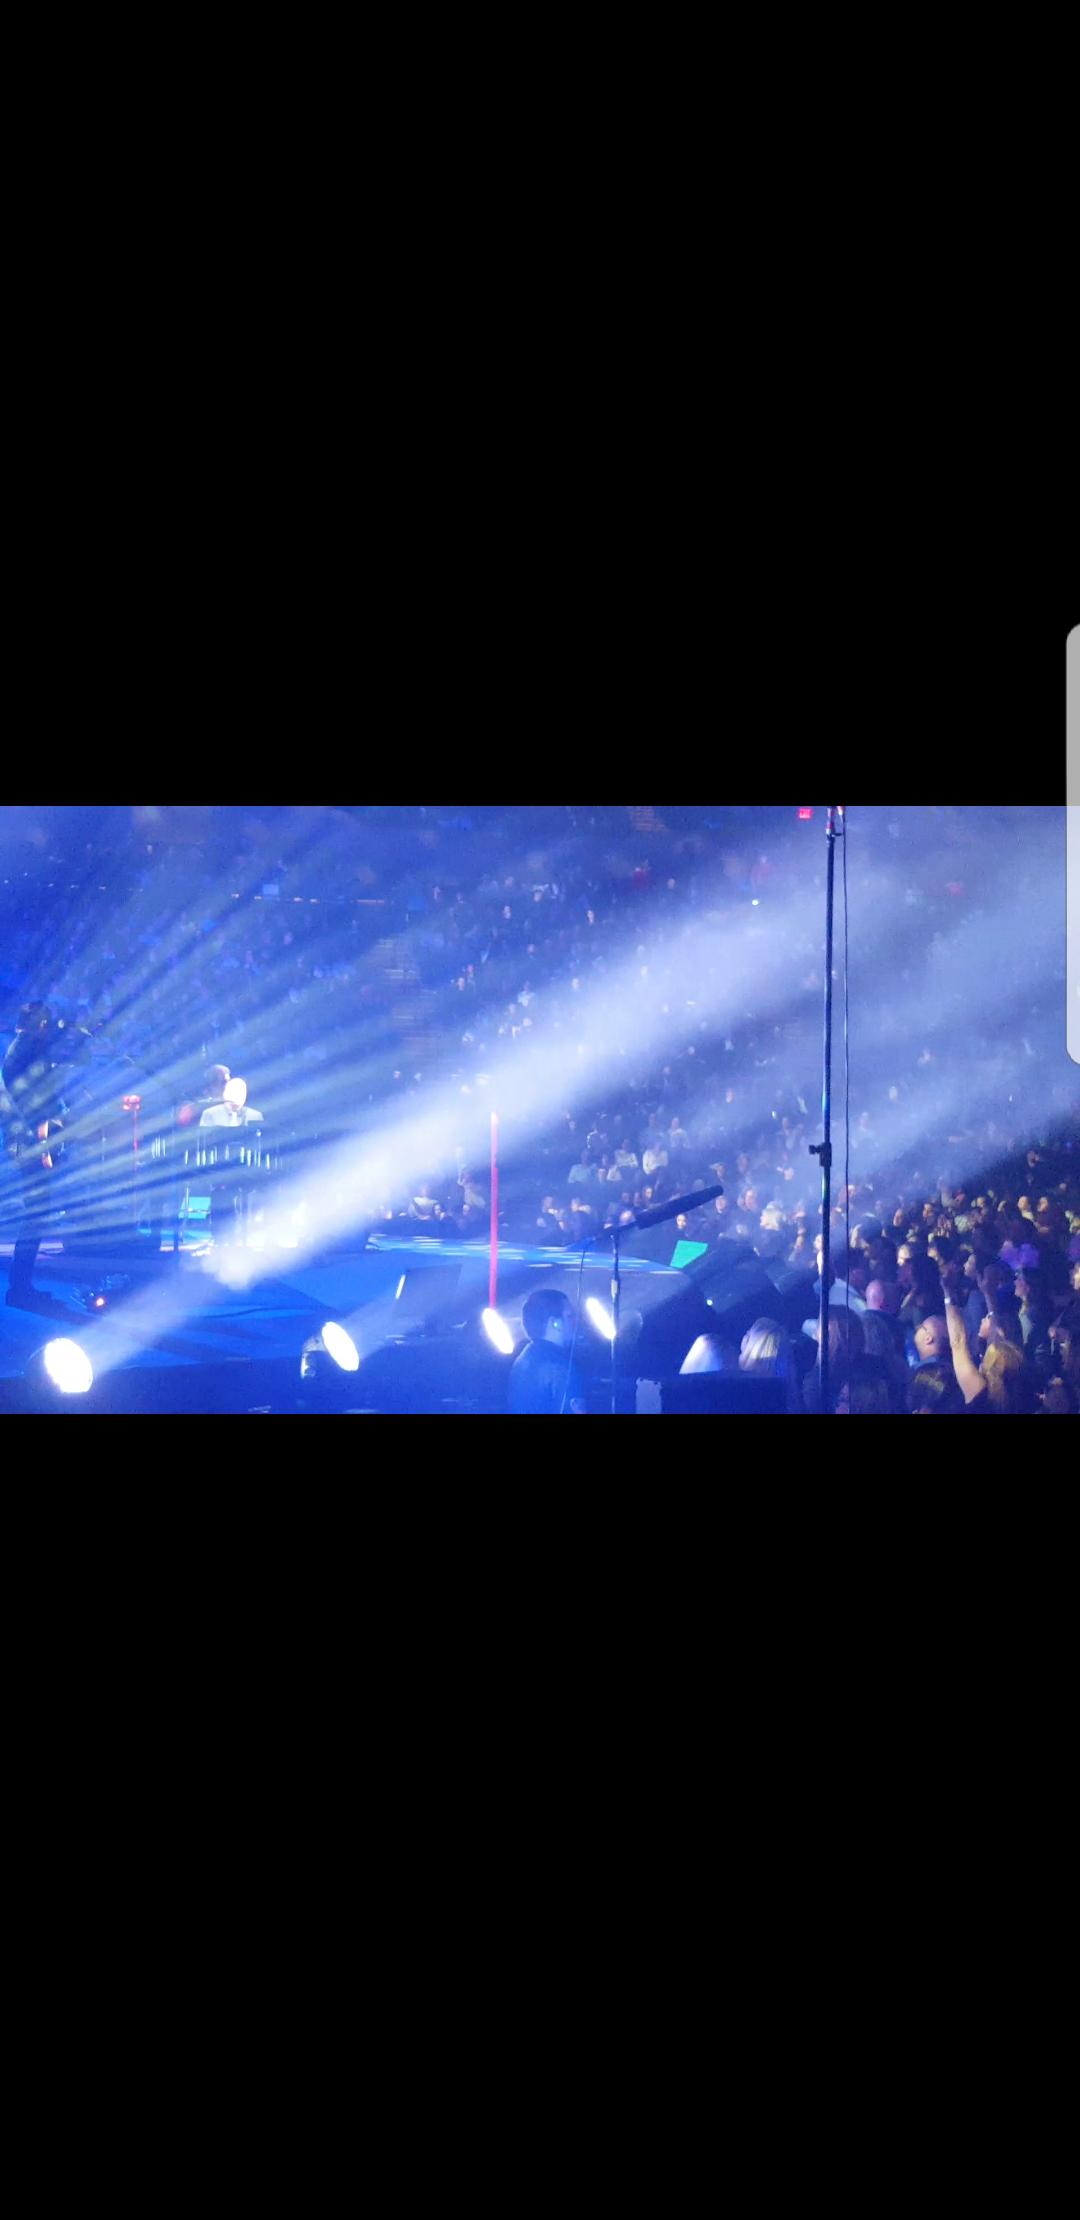 concert shot 1.jpg.png